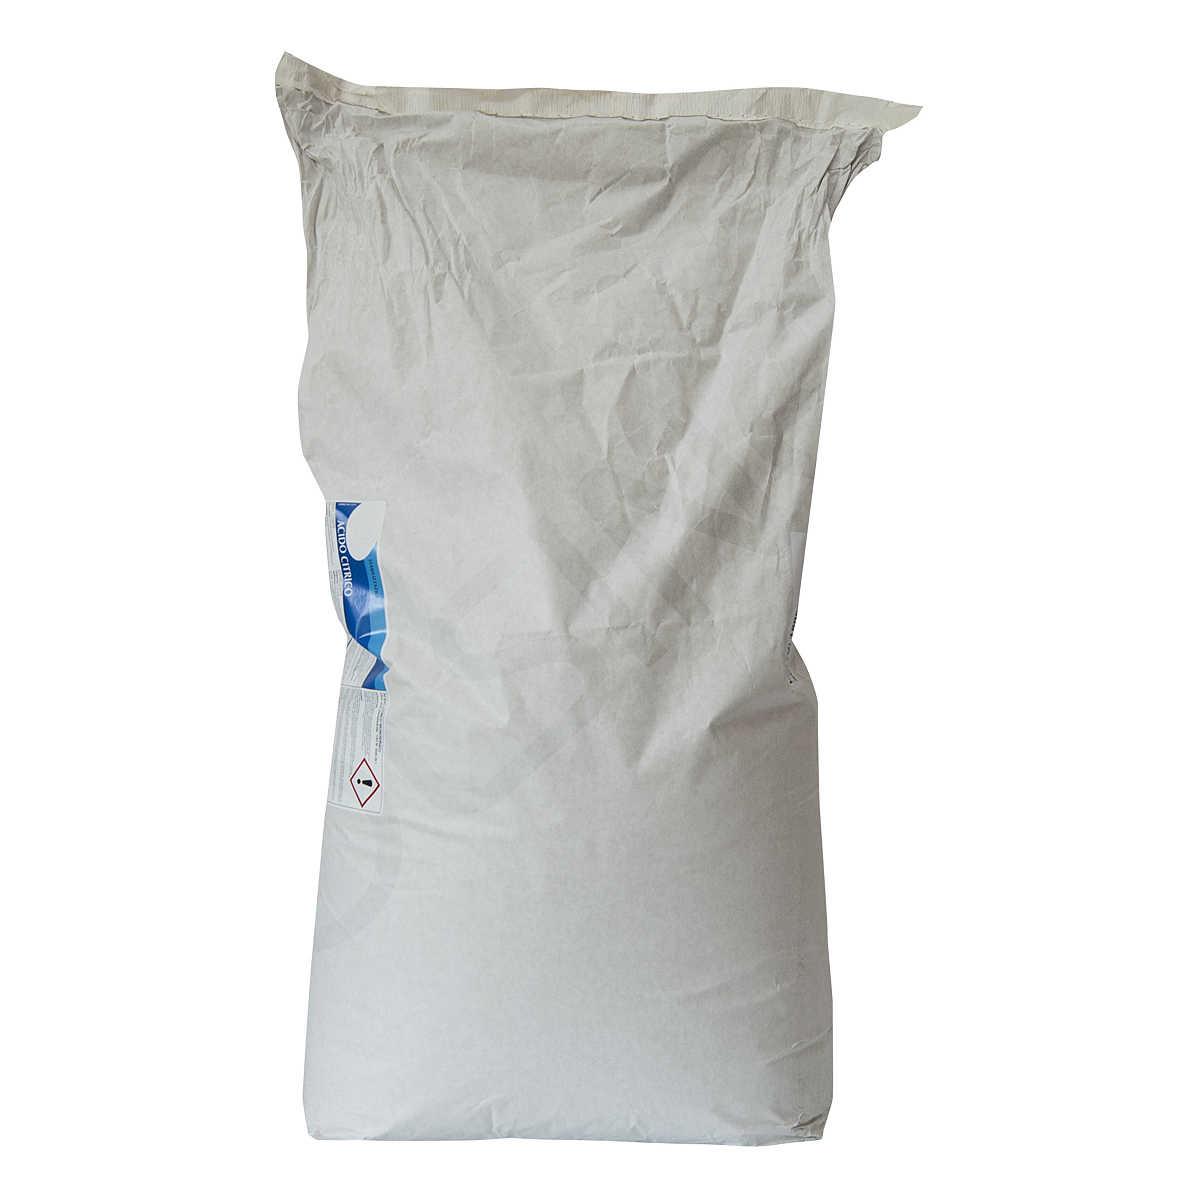 Acido Citrico Dosi Alimentari acido citrico 25 kg